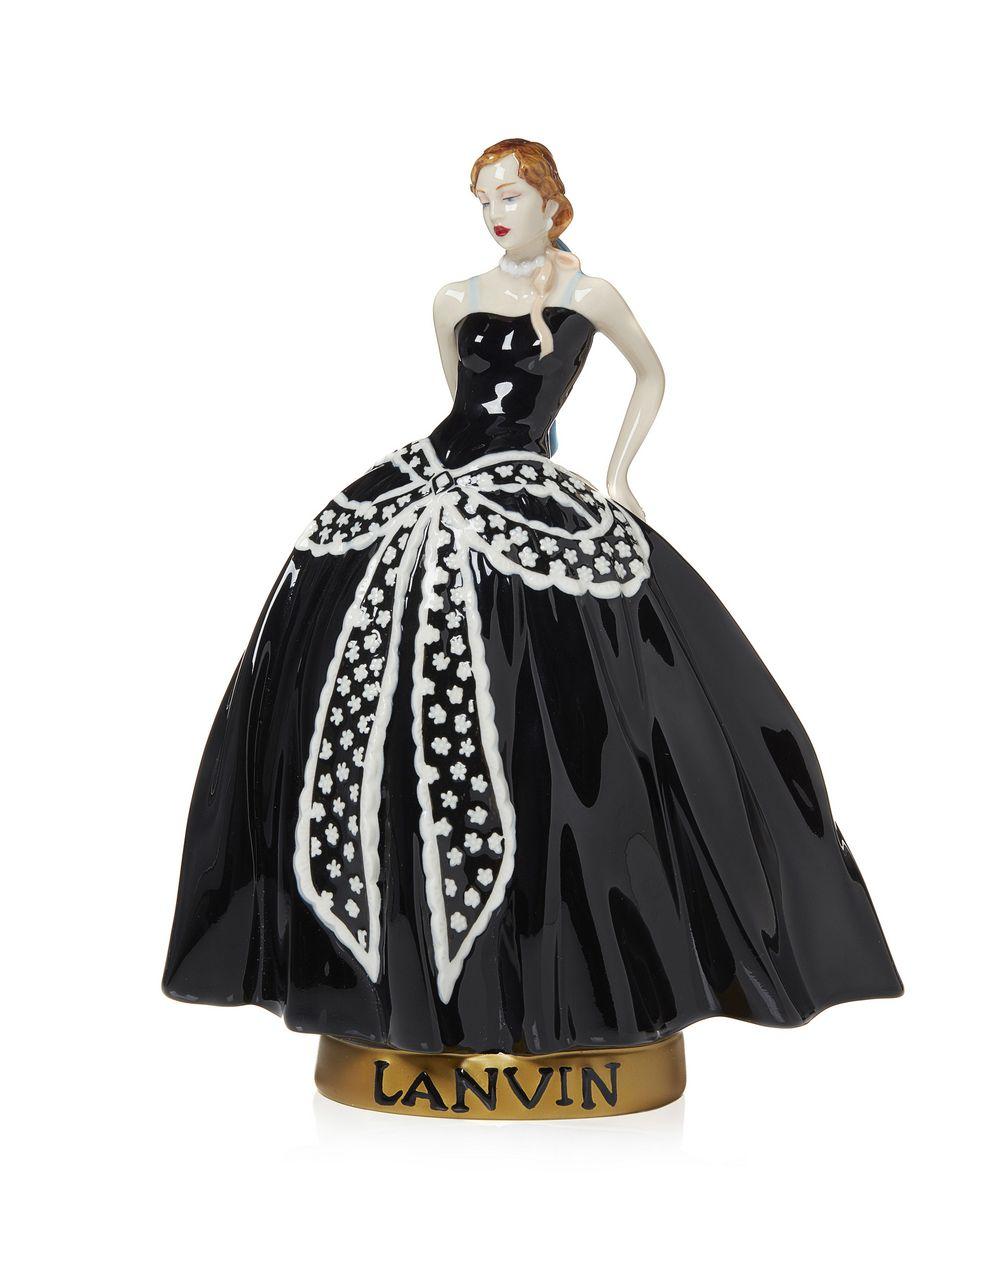 Miss Lanvin 54 - Lanvin